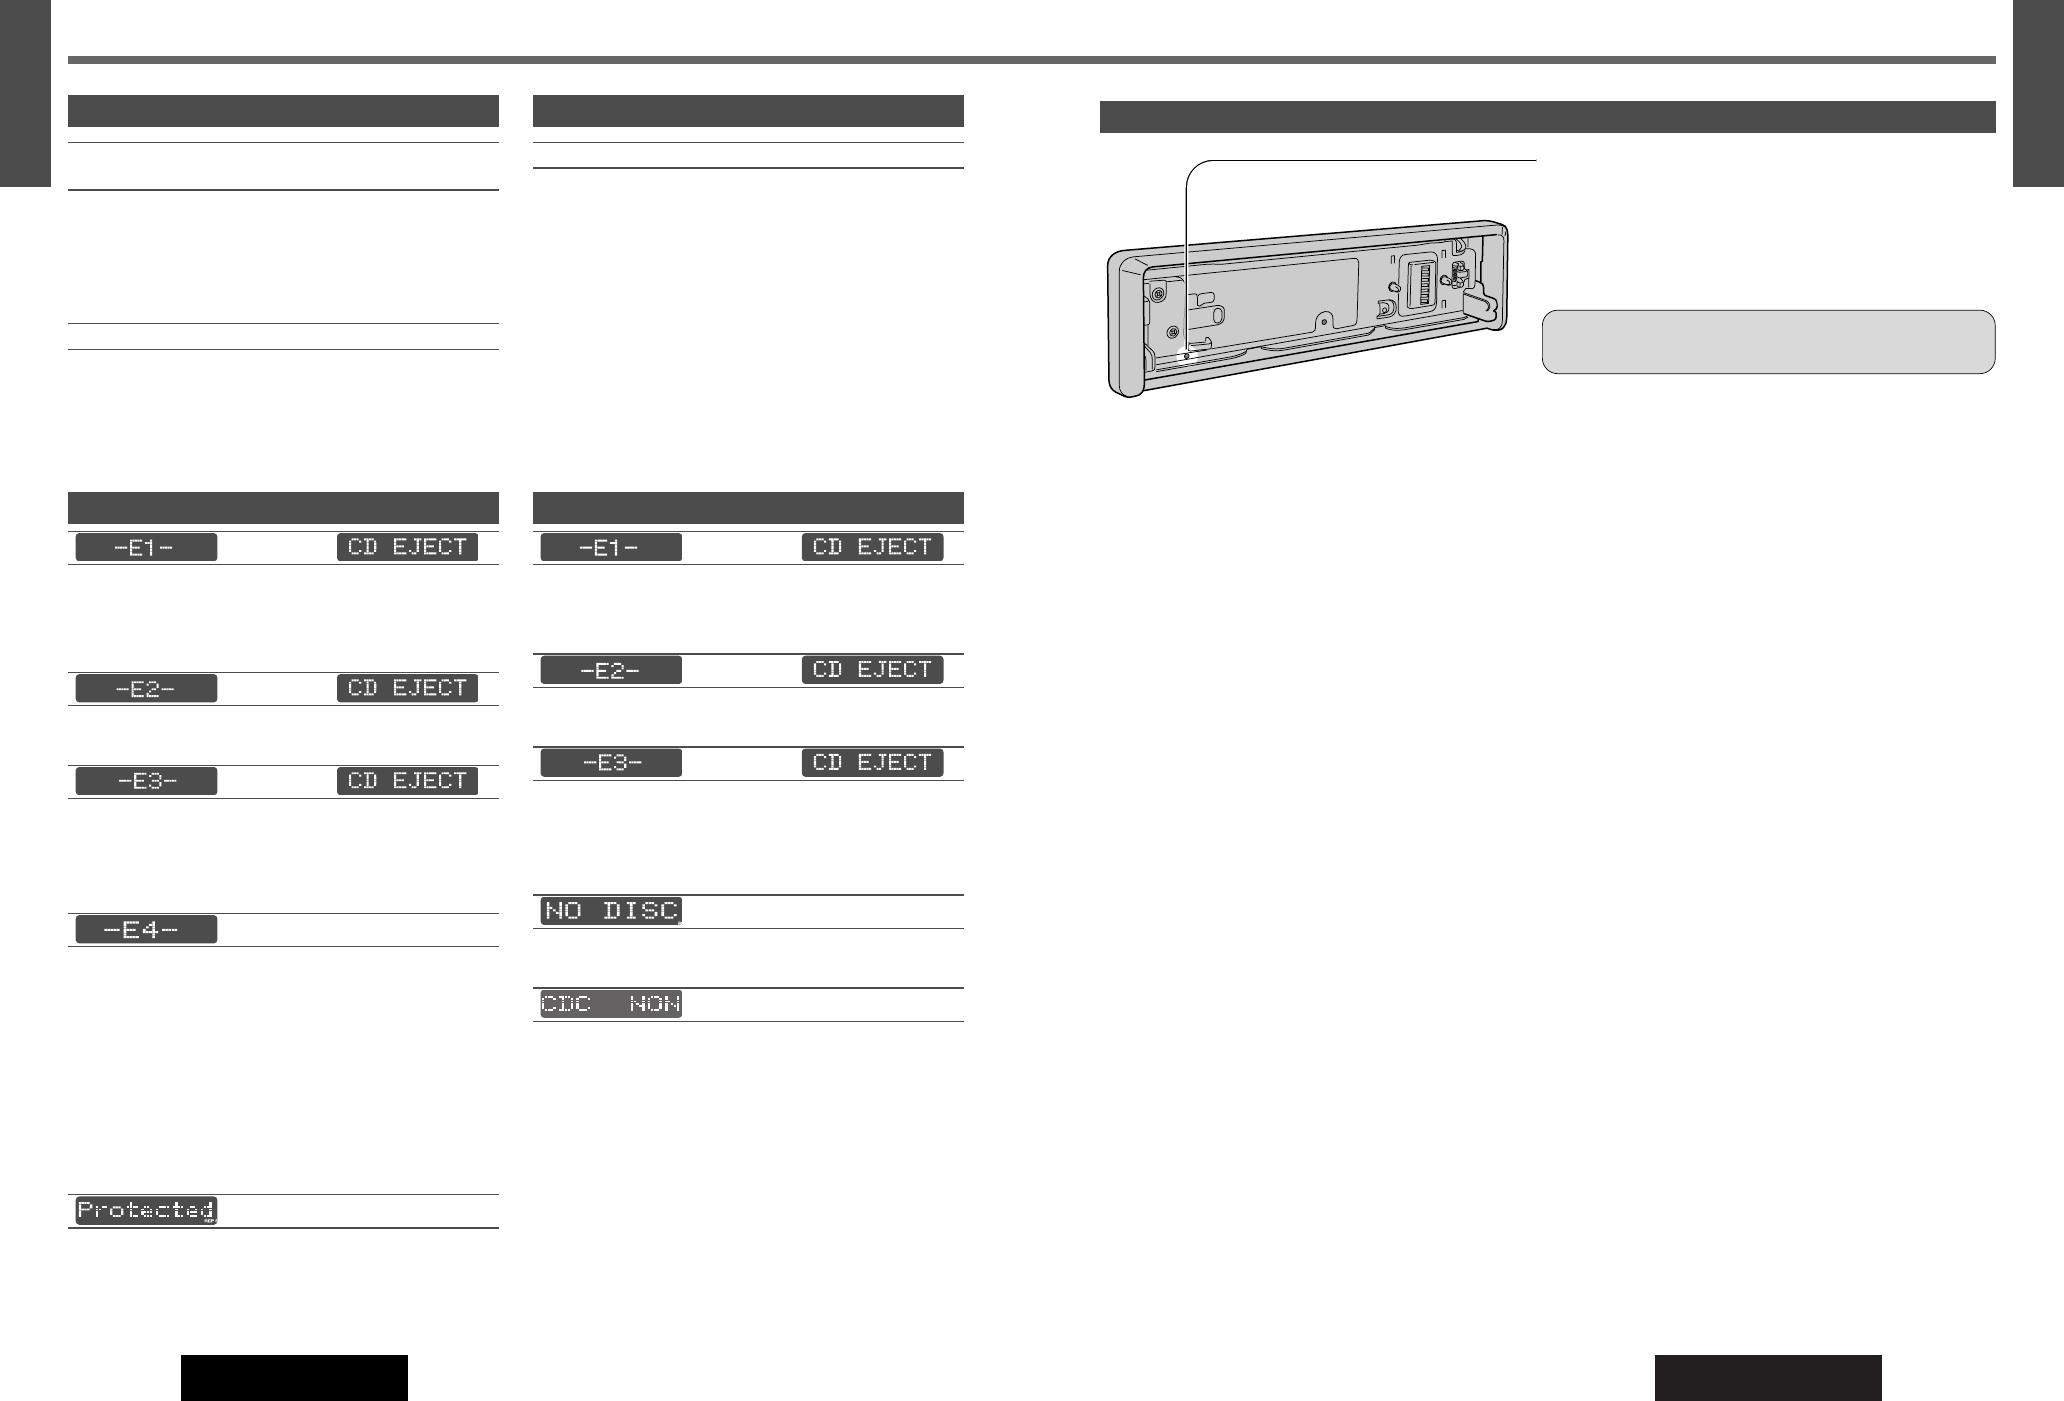 Handleiding Panasonic cq-hx1083n (pagina 18 van 23) (English)